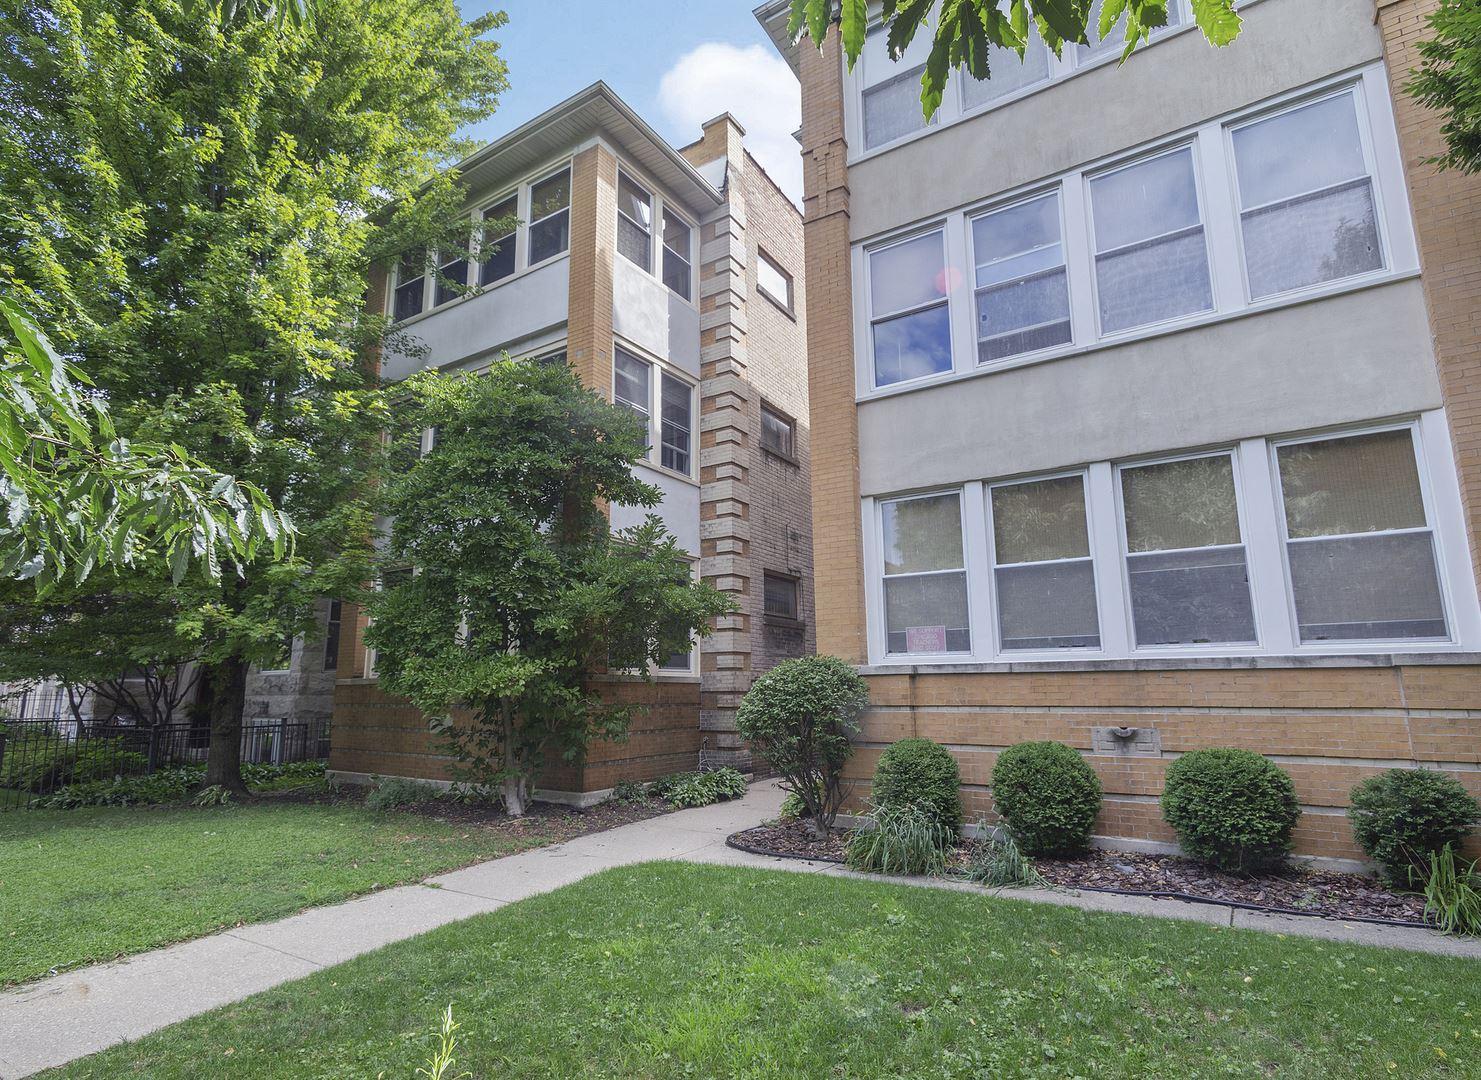 4725 N Beacon Street #1, Chicago, IL 60640 - #: 10809151